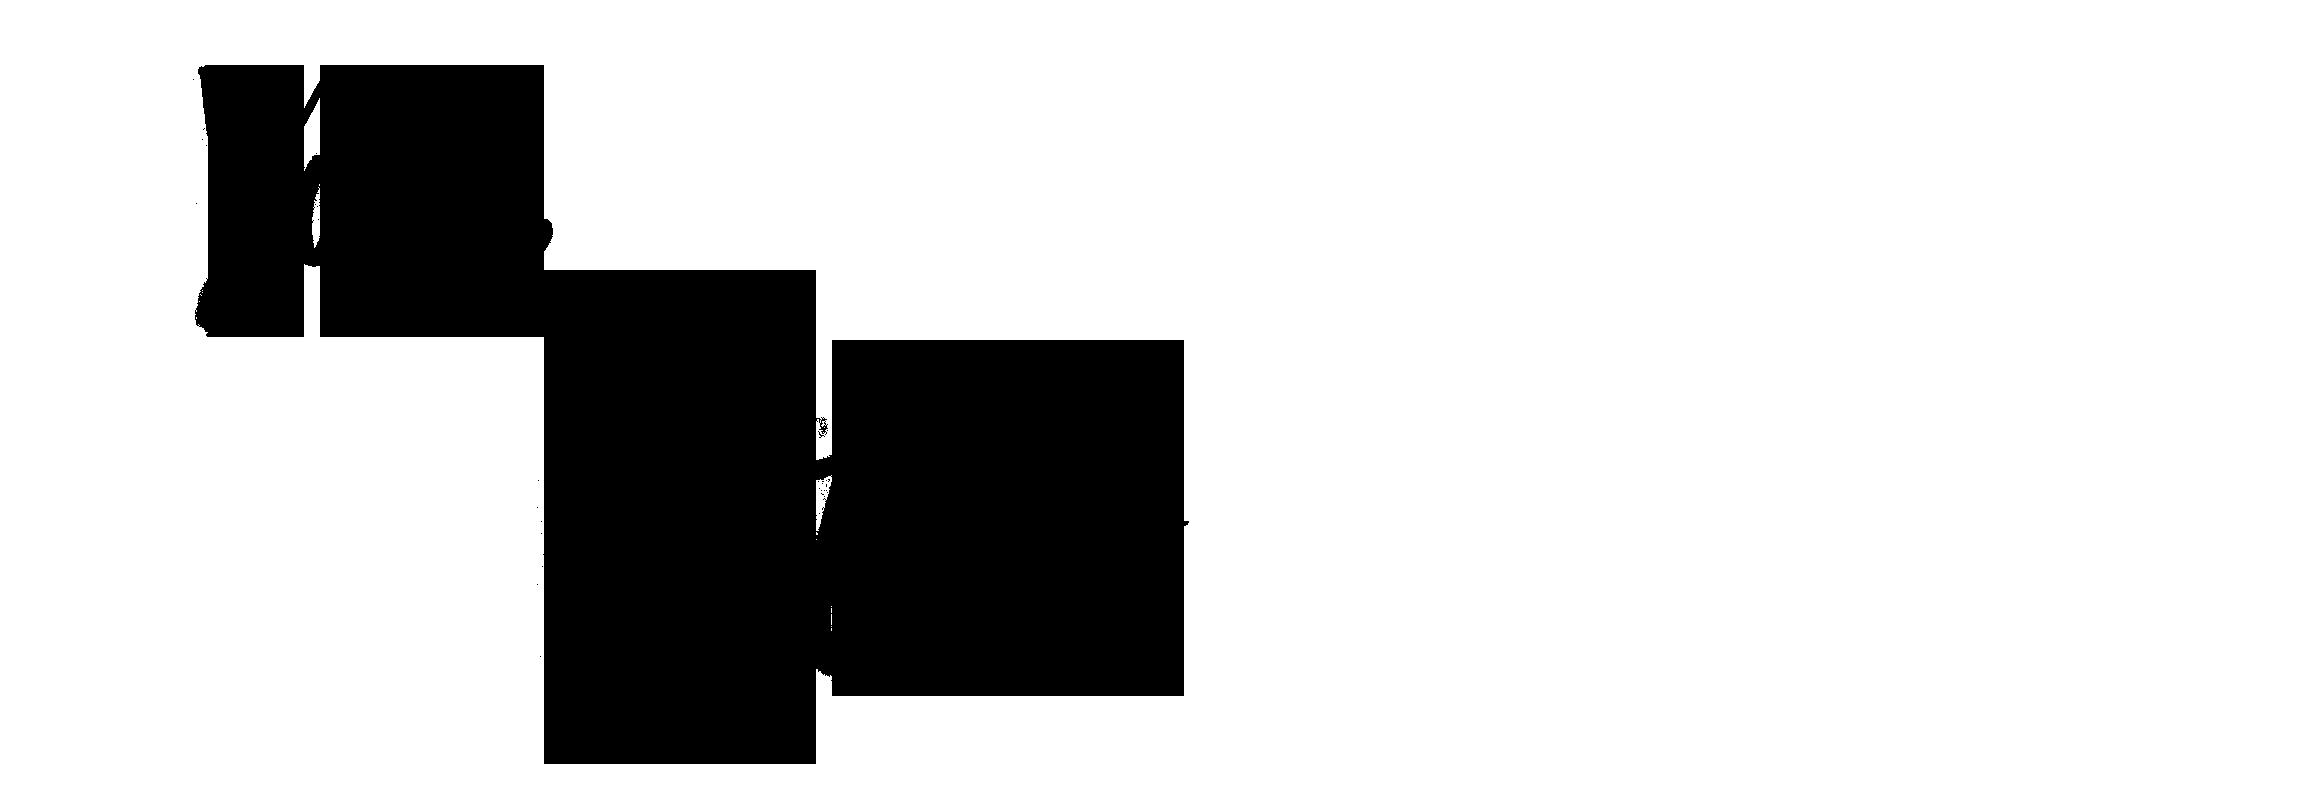 VICTORIA PANTOVIC BLOG SIGNATURE